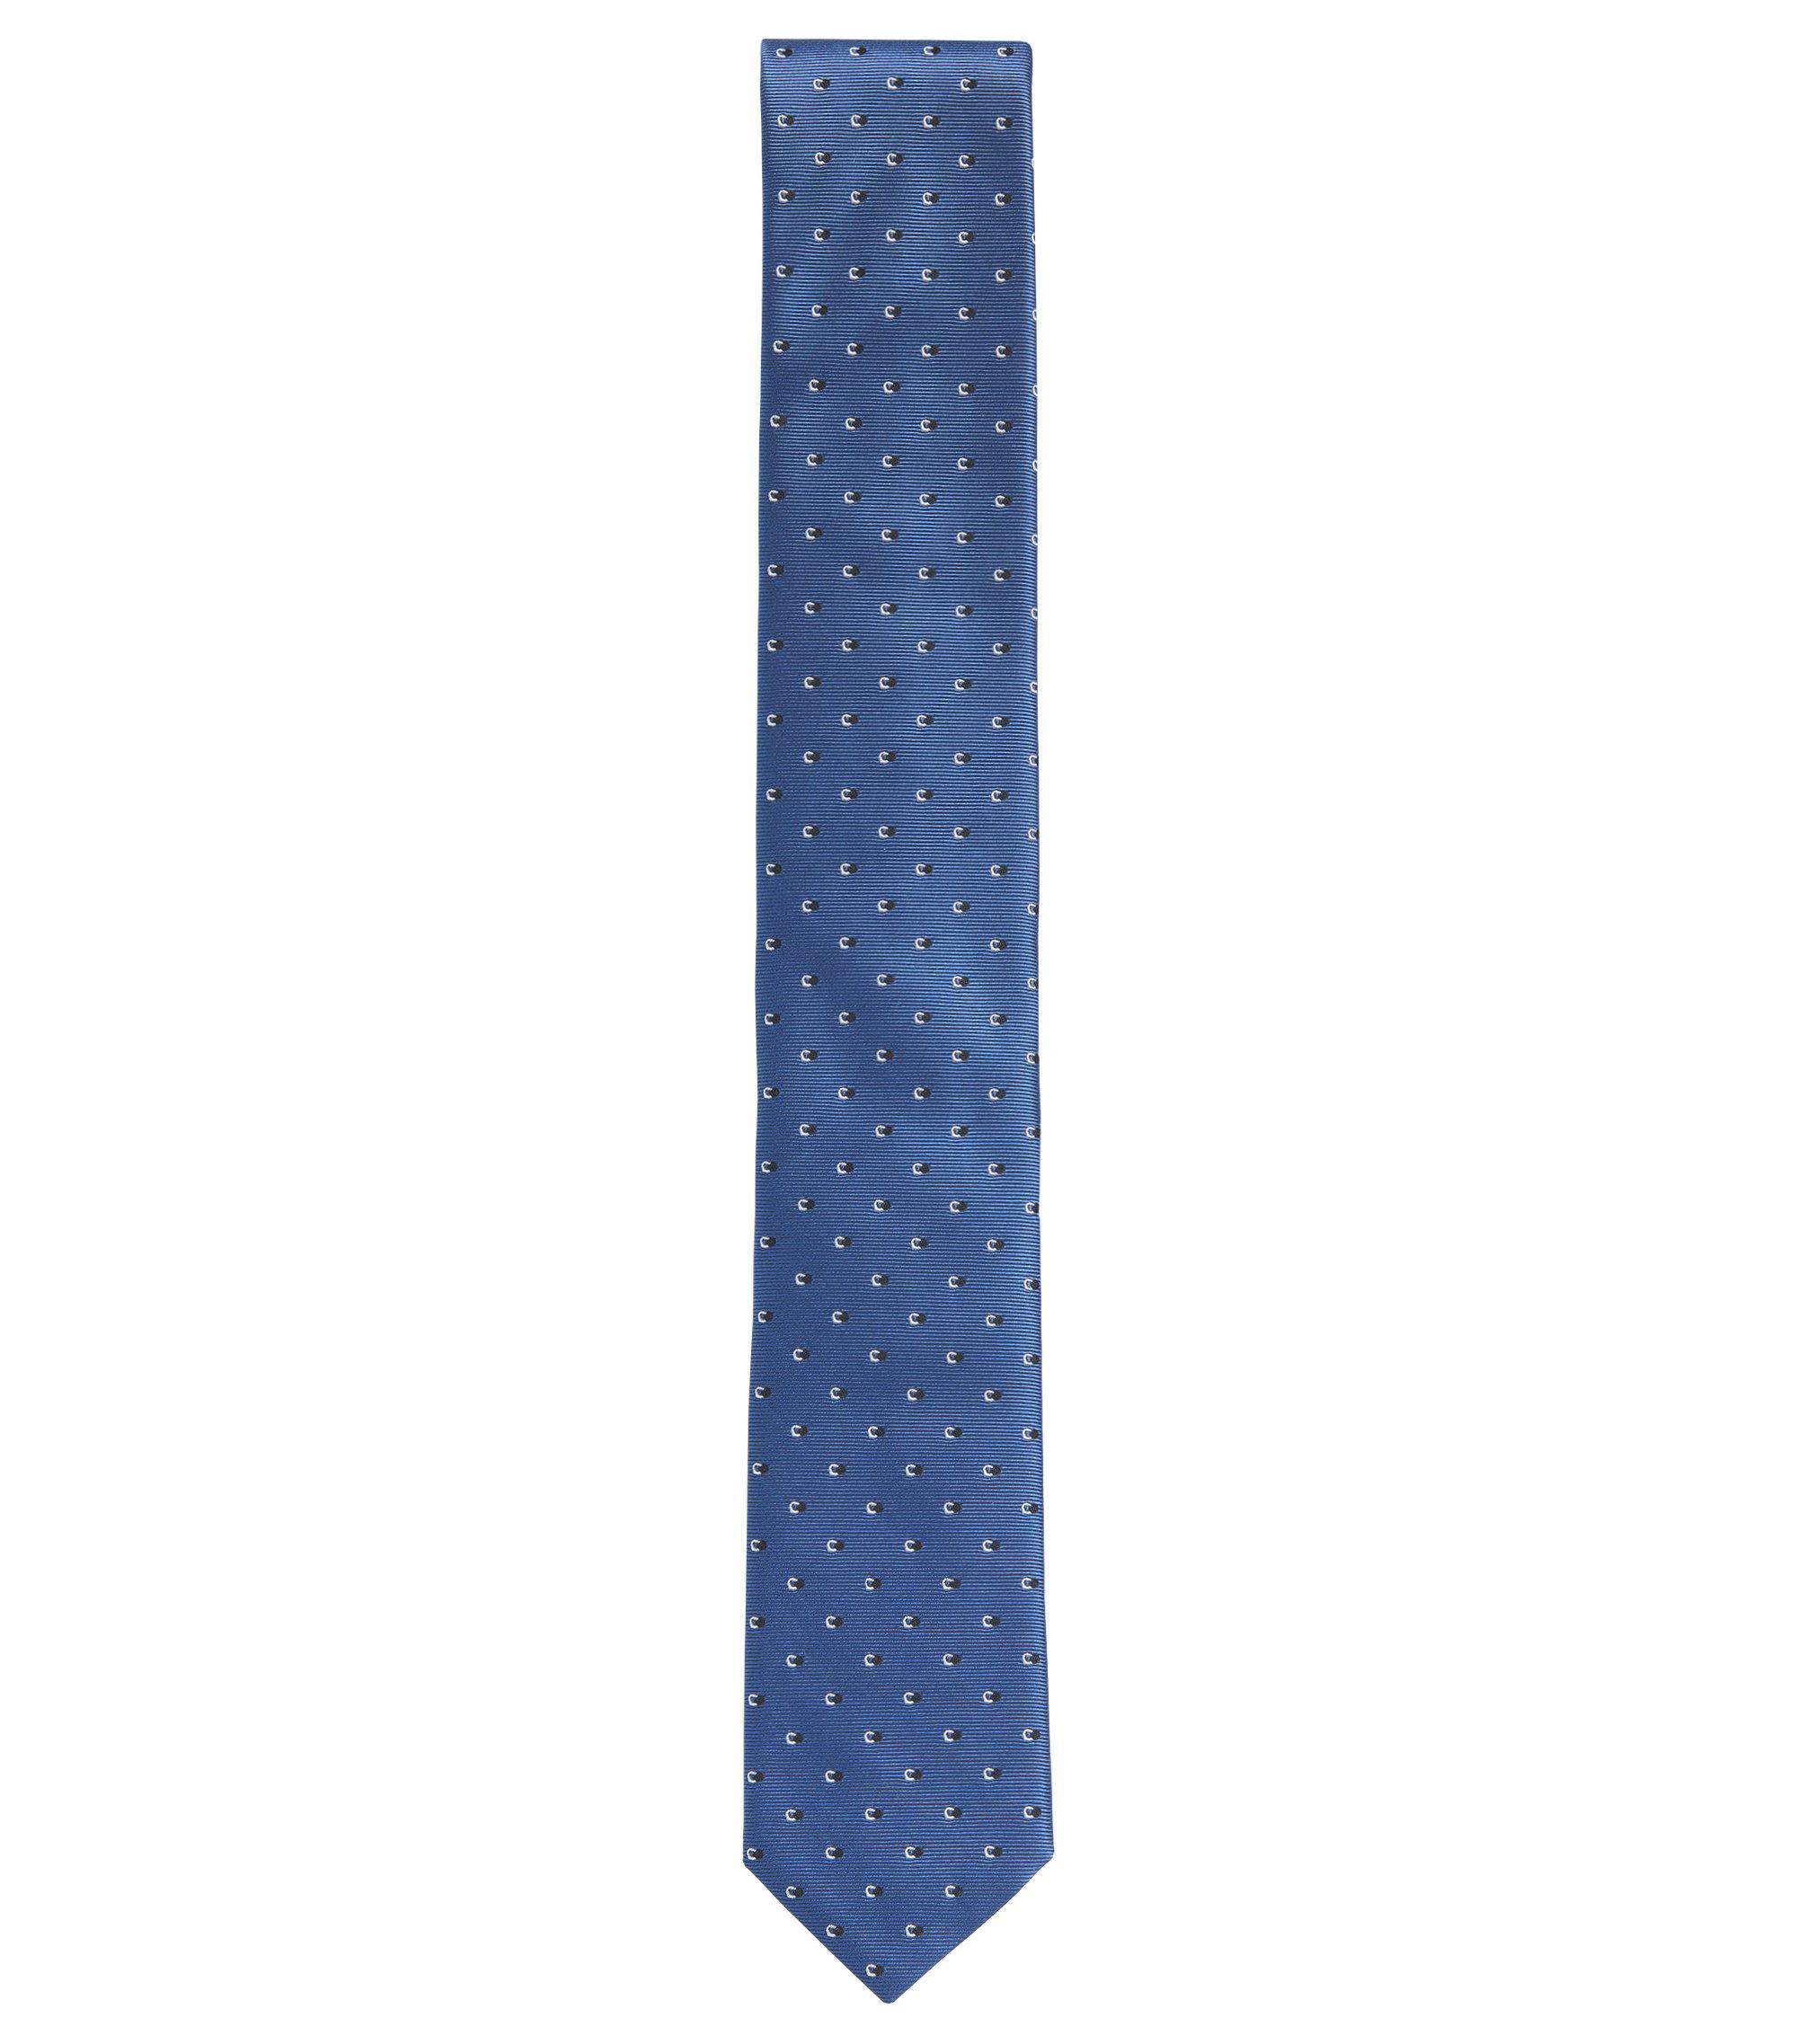 'Tie 6 cm' | Slim, Silk Embroidered Tie, Turquoise